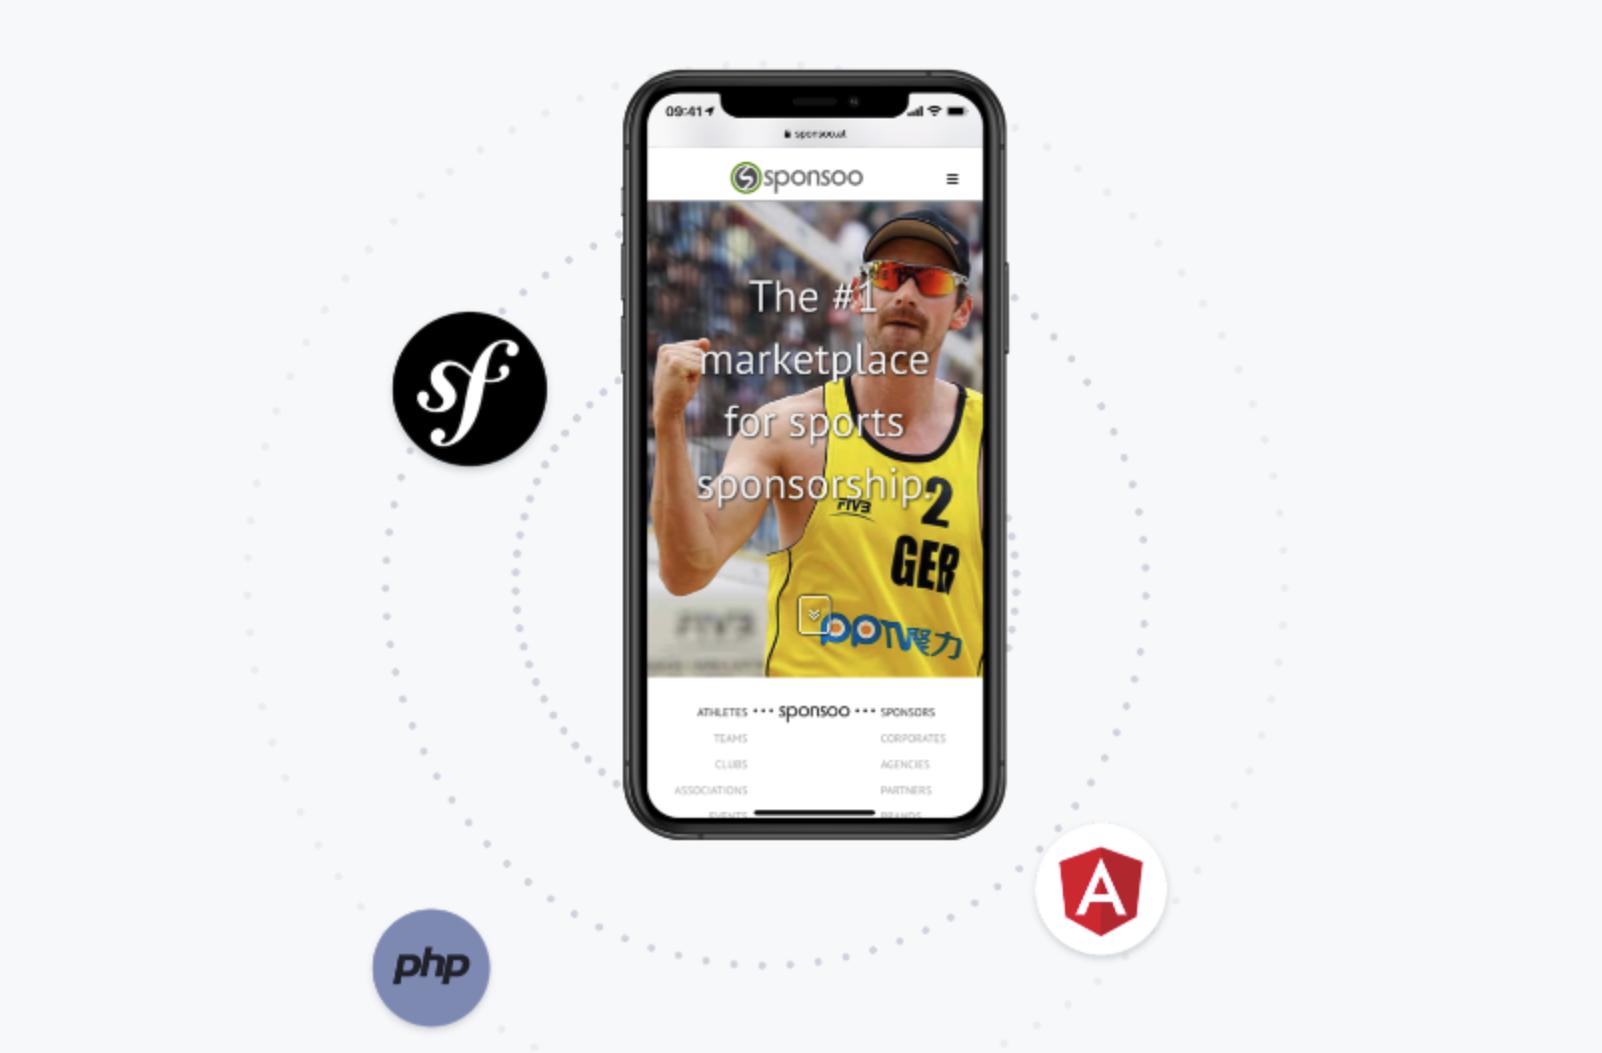 Success story: Sponsoo as Europe's largest sports sponsorship platform